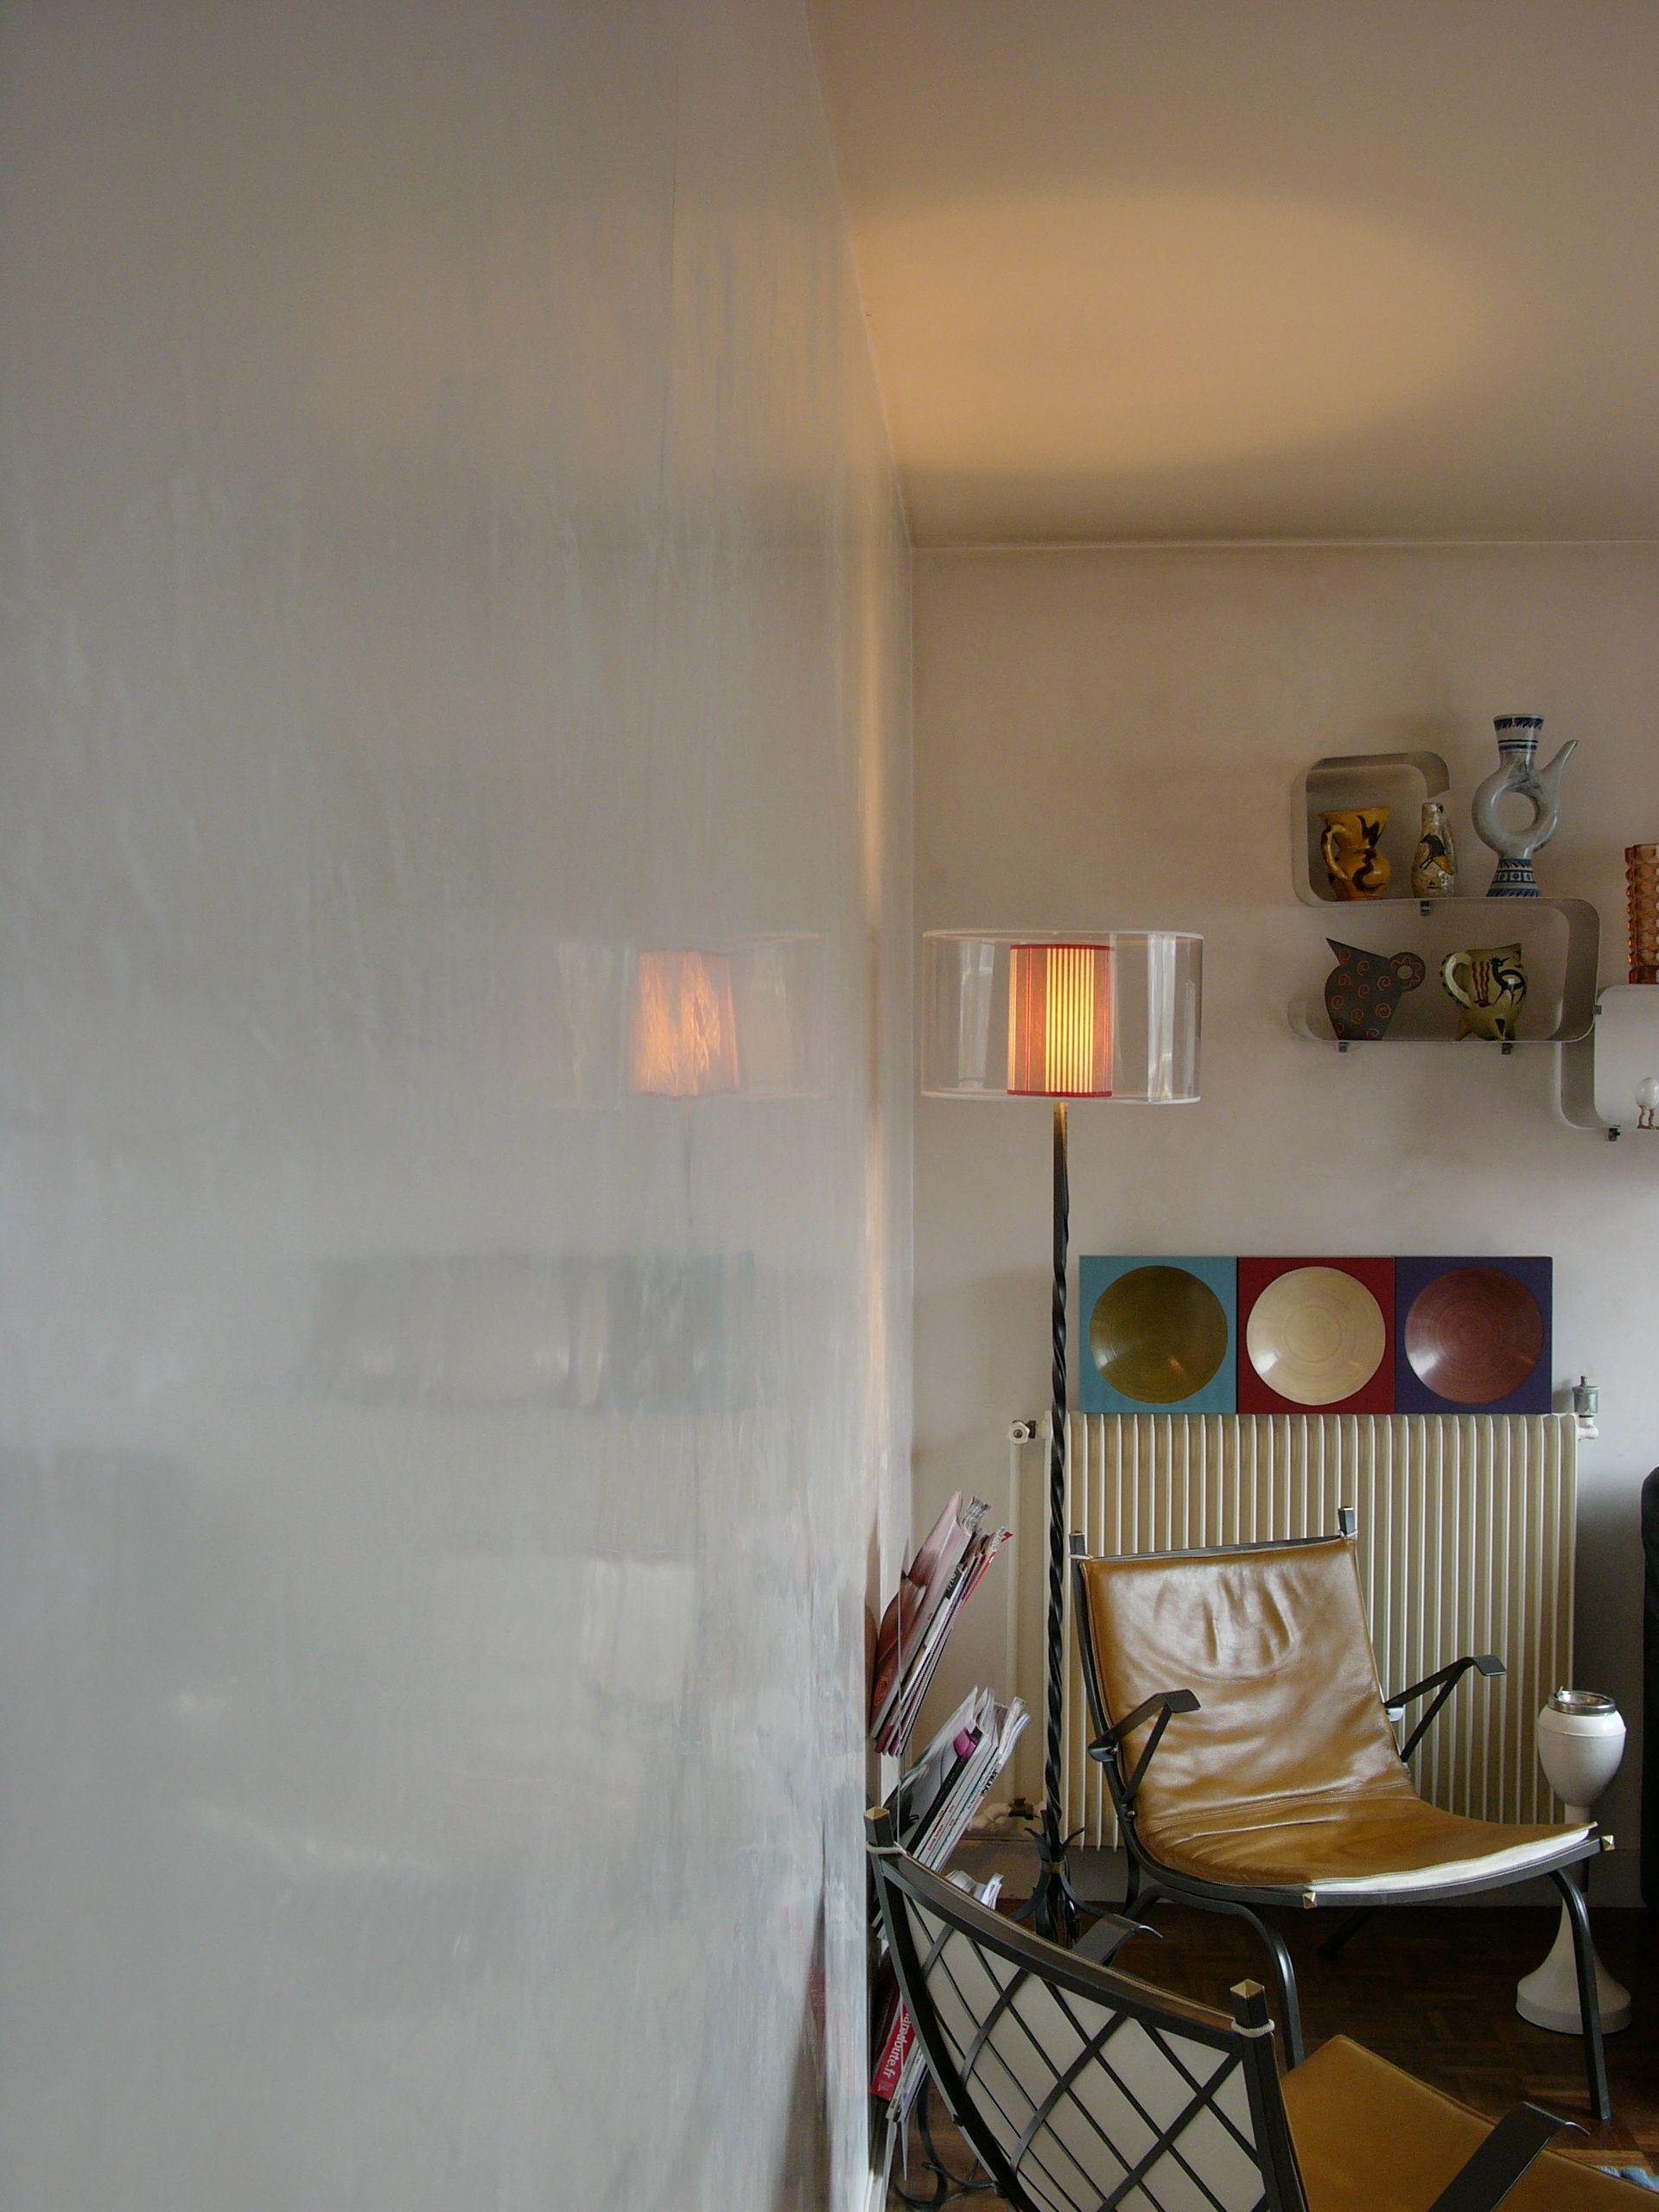 Stucco blanc nacré avec Anne Sarrazanas  https://www.facebook.com/zinzoline-peinture-d%C3%A9co-139089589494474/photos